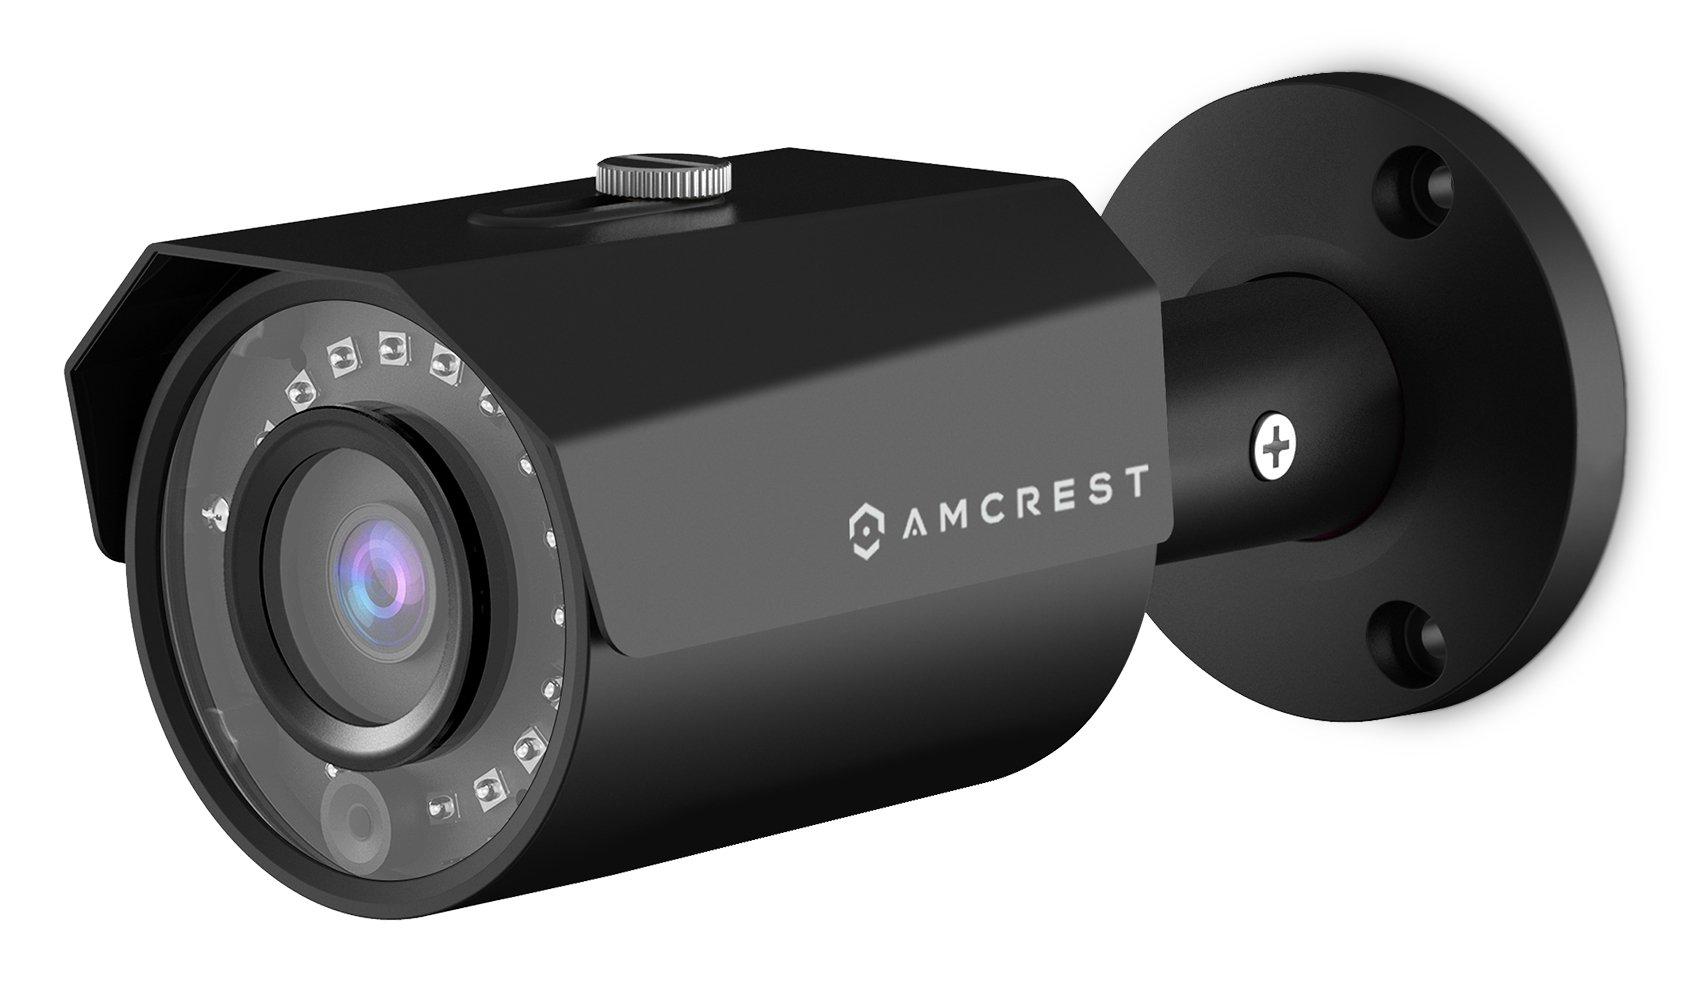 Amcrest 4MP POE IP Camera UltraHD Outdoor Security Camera Bullet - IP67 Weatherproof, 4-Megapixel (2688 TVL), 98ft Night Vision, Surveillance Camera, IP4M-1024E (Black)